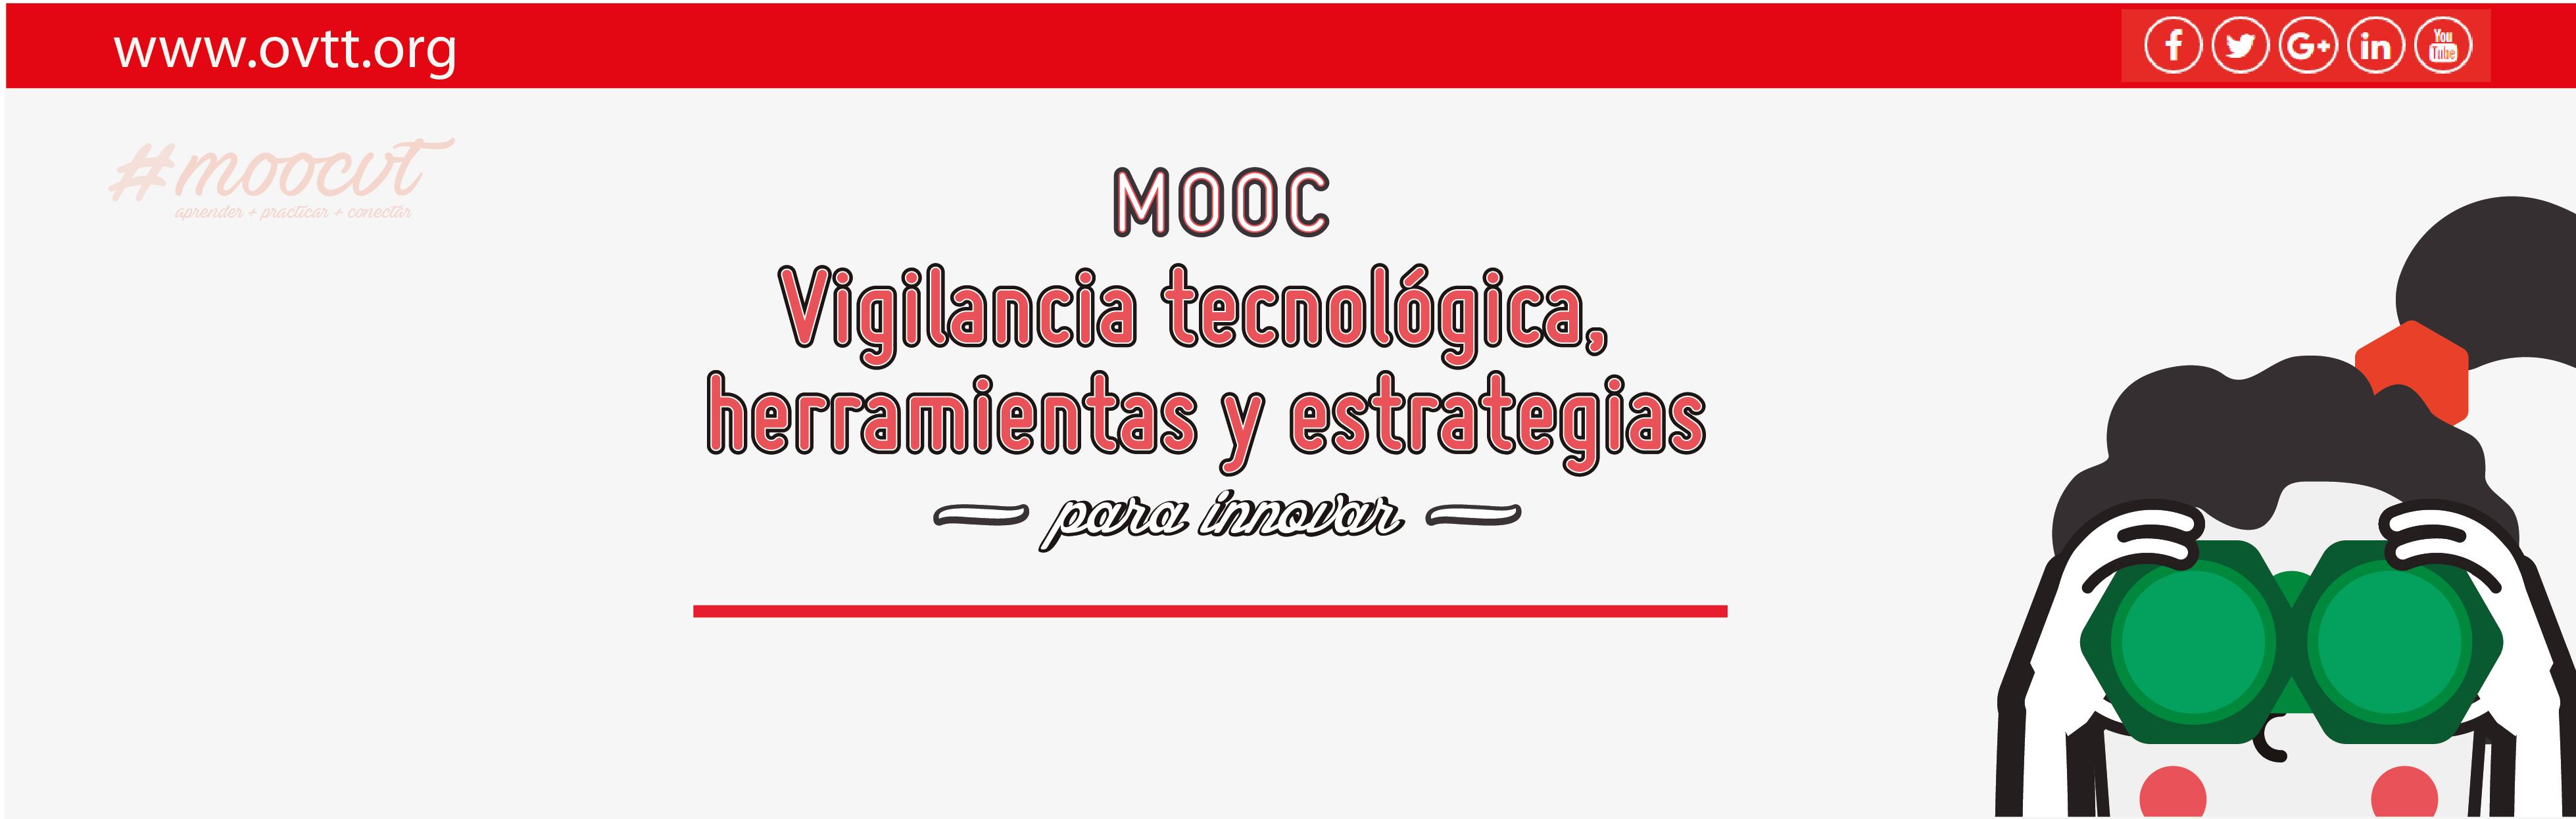 moocvt-redue-01